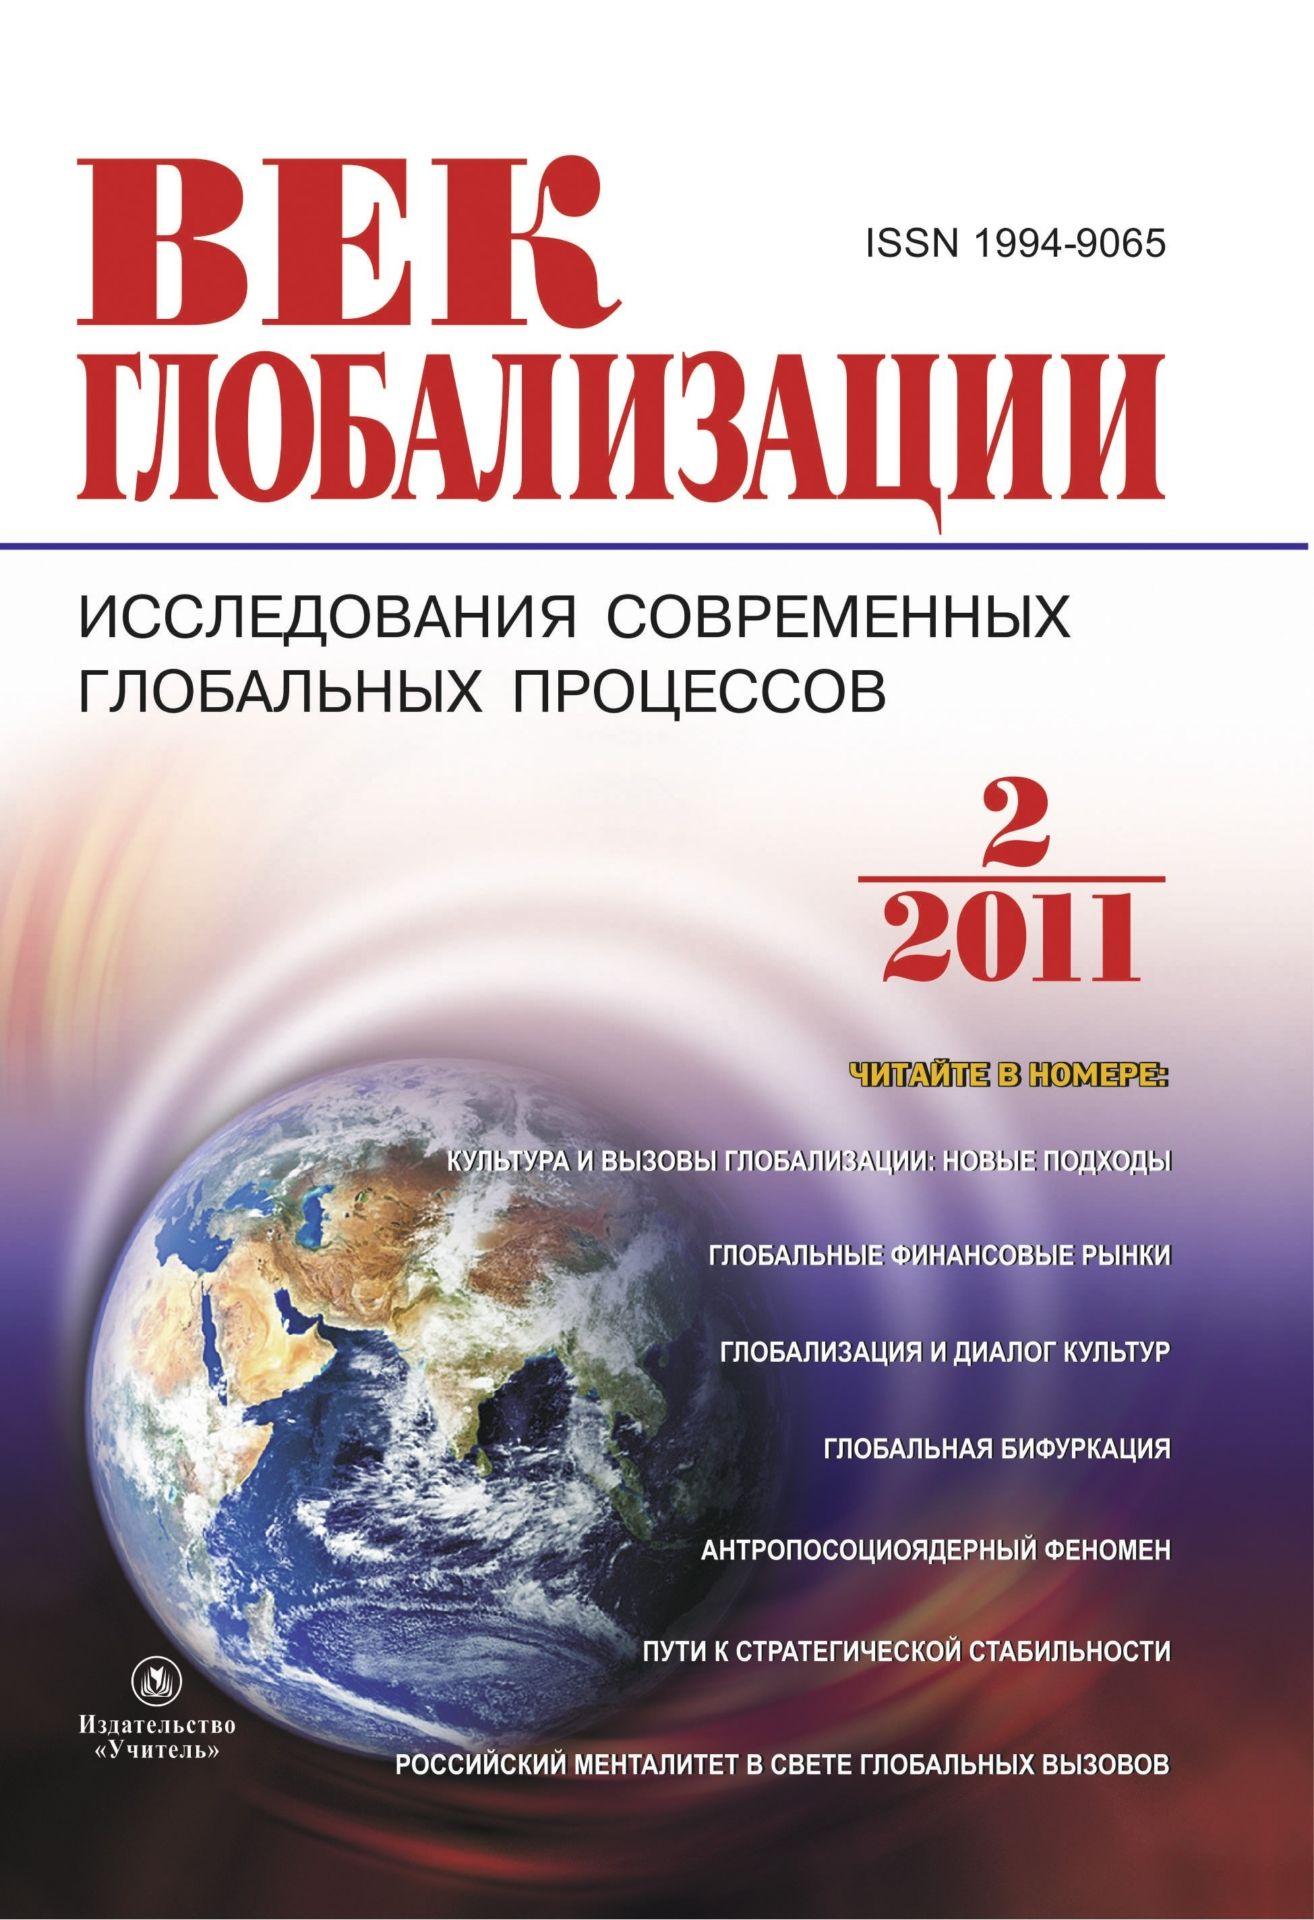 Журнал Век глобализации № 2 2011